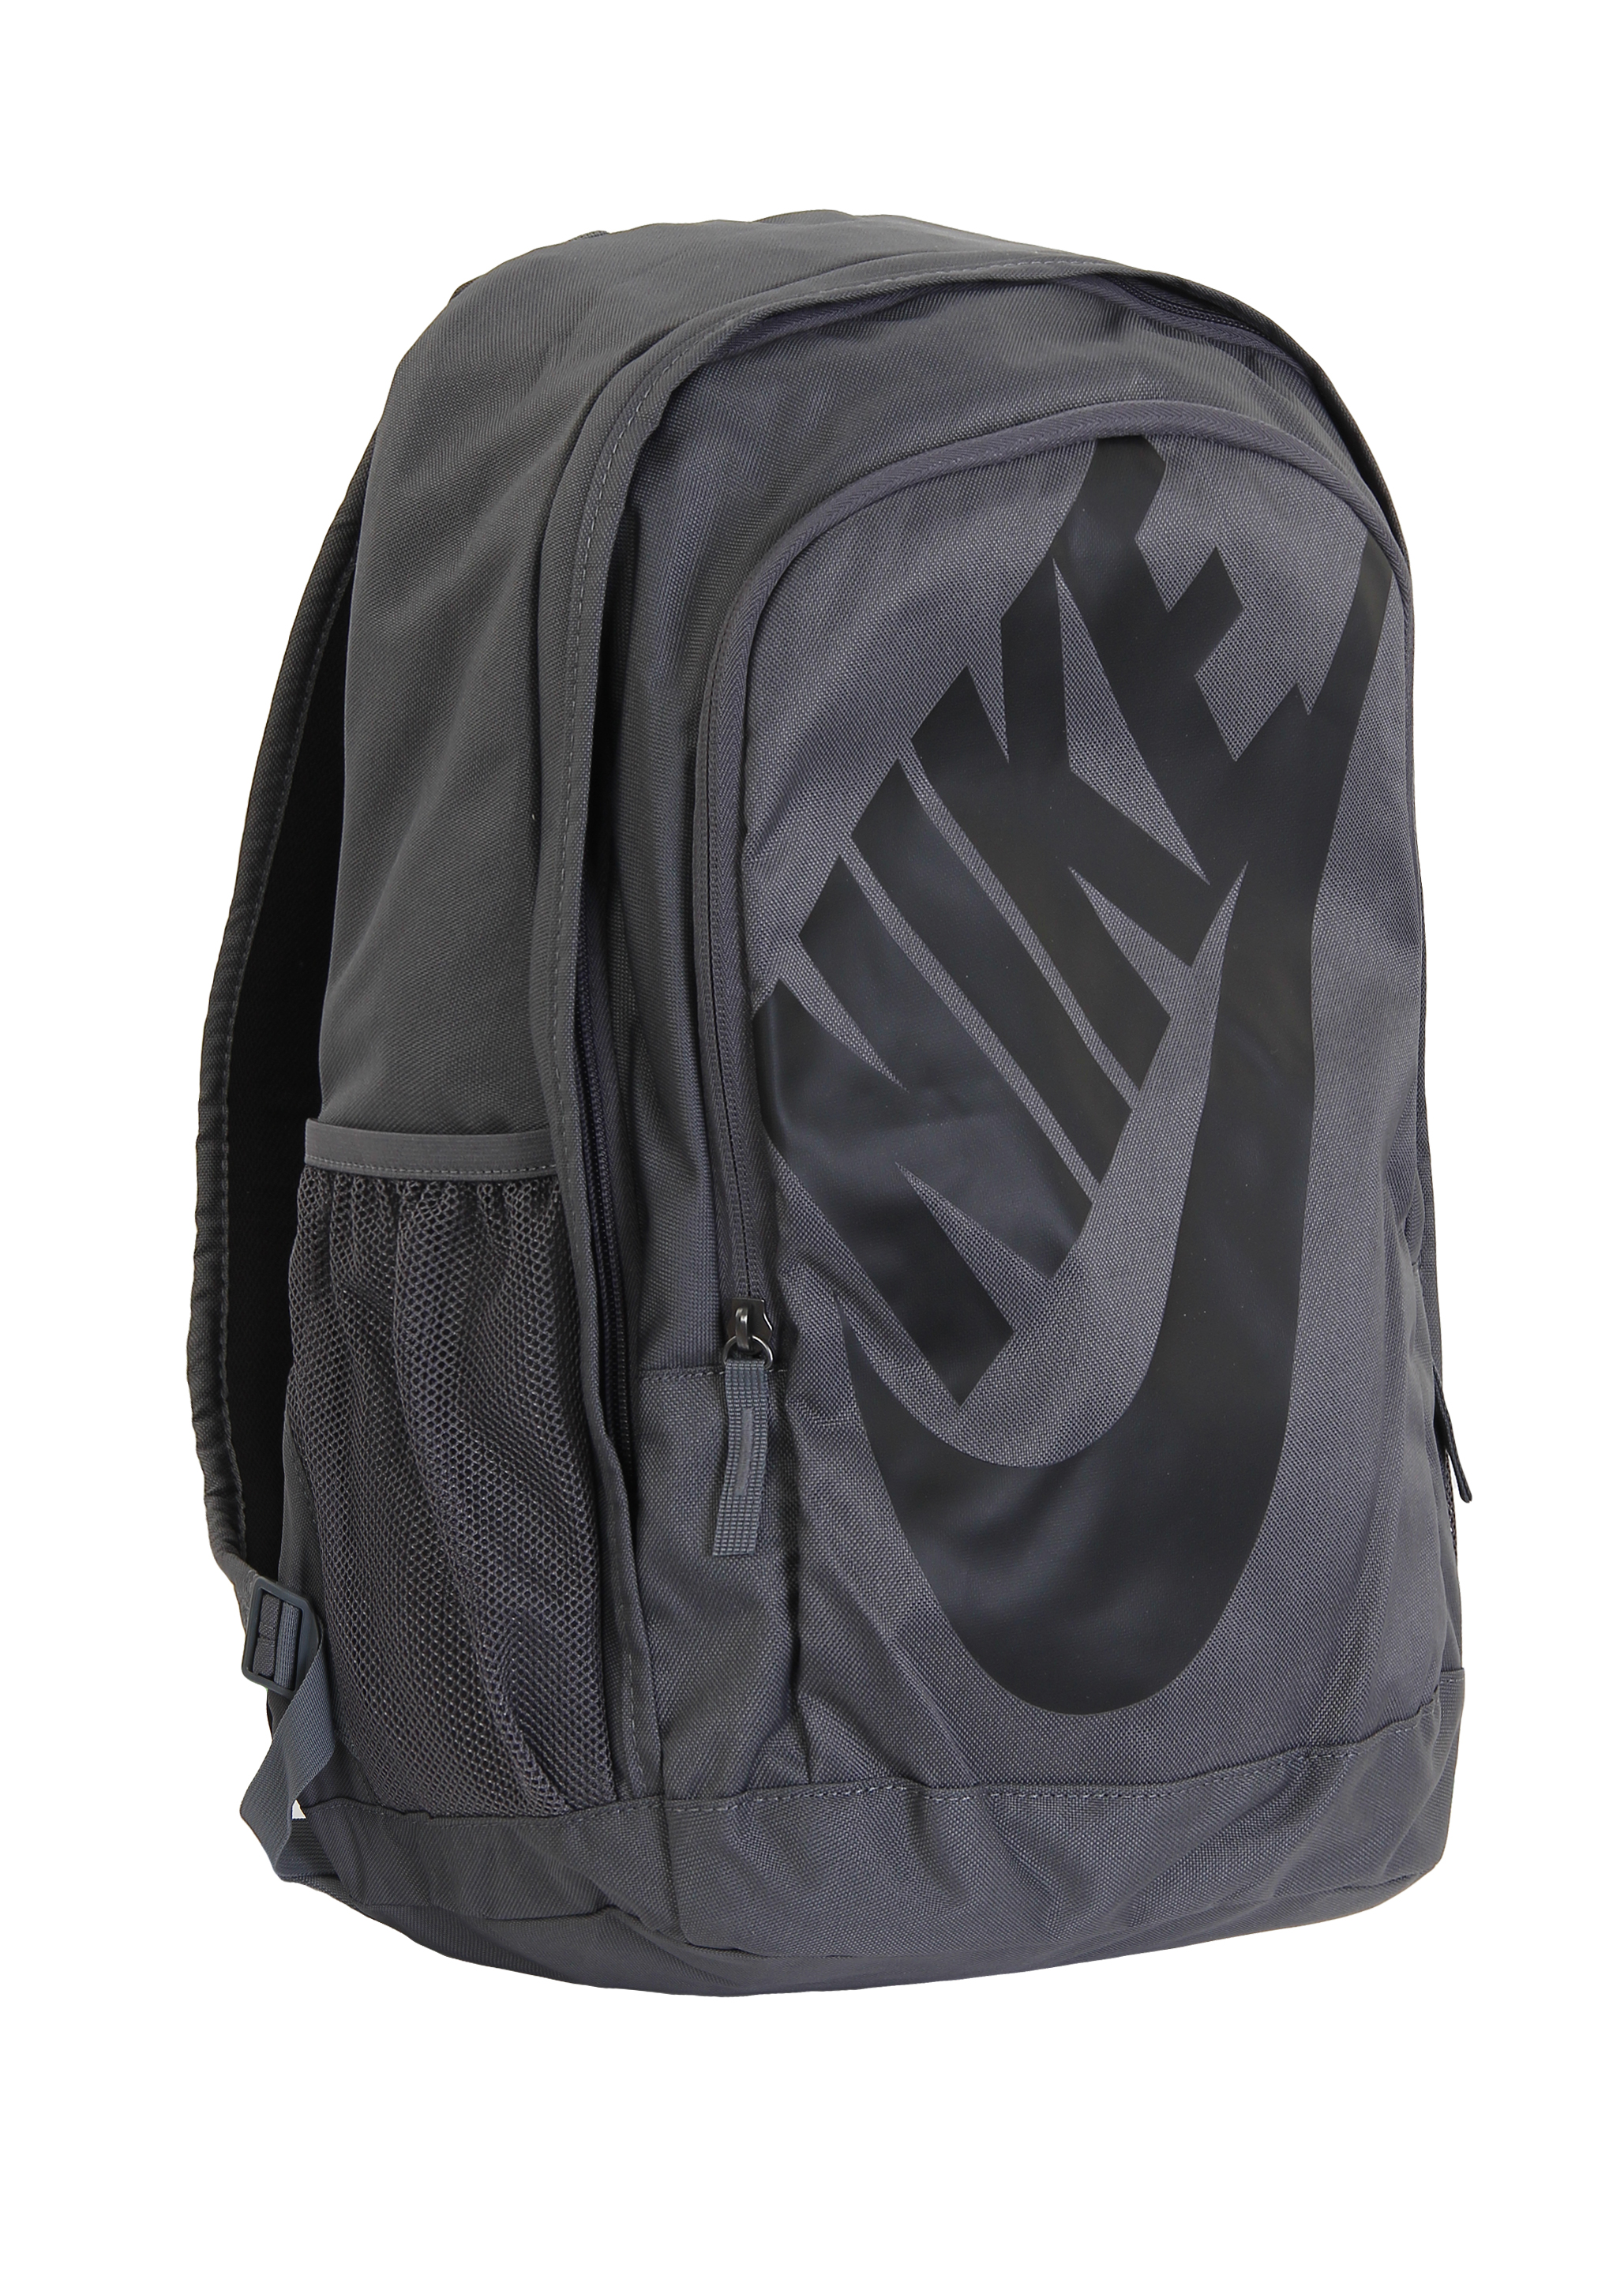 Рюкзак Nike Sportswear Hayward Futura 2.0 - Сеть спортивных ... 3a544a9e957d